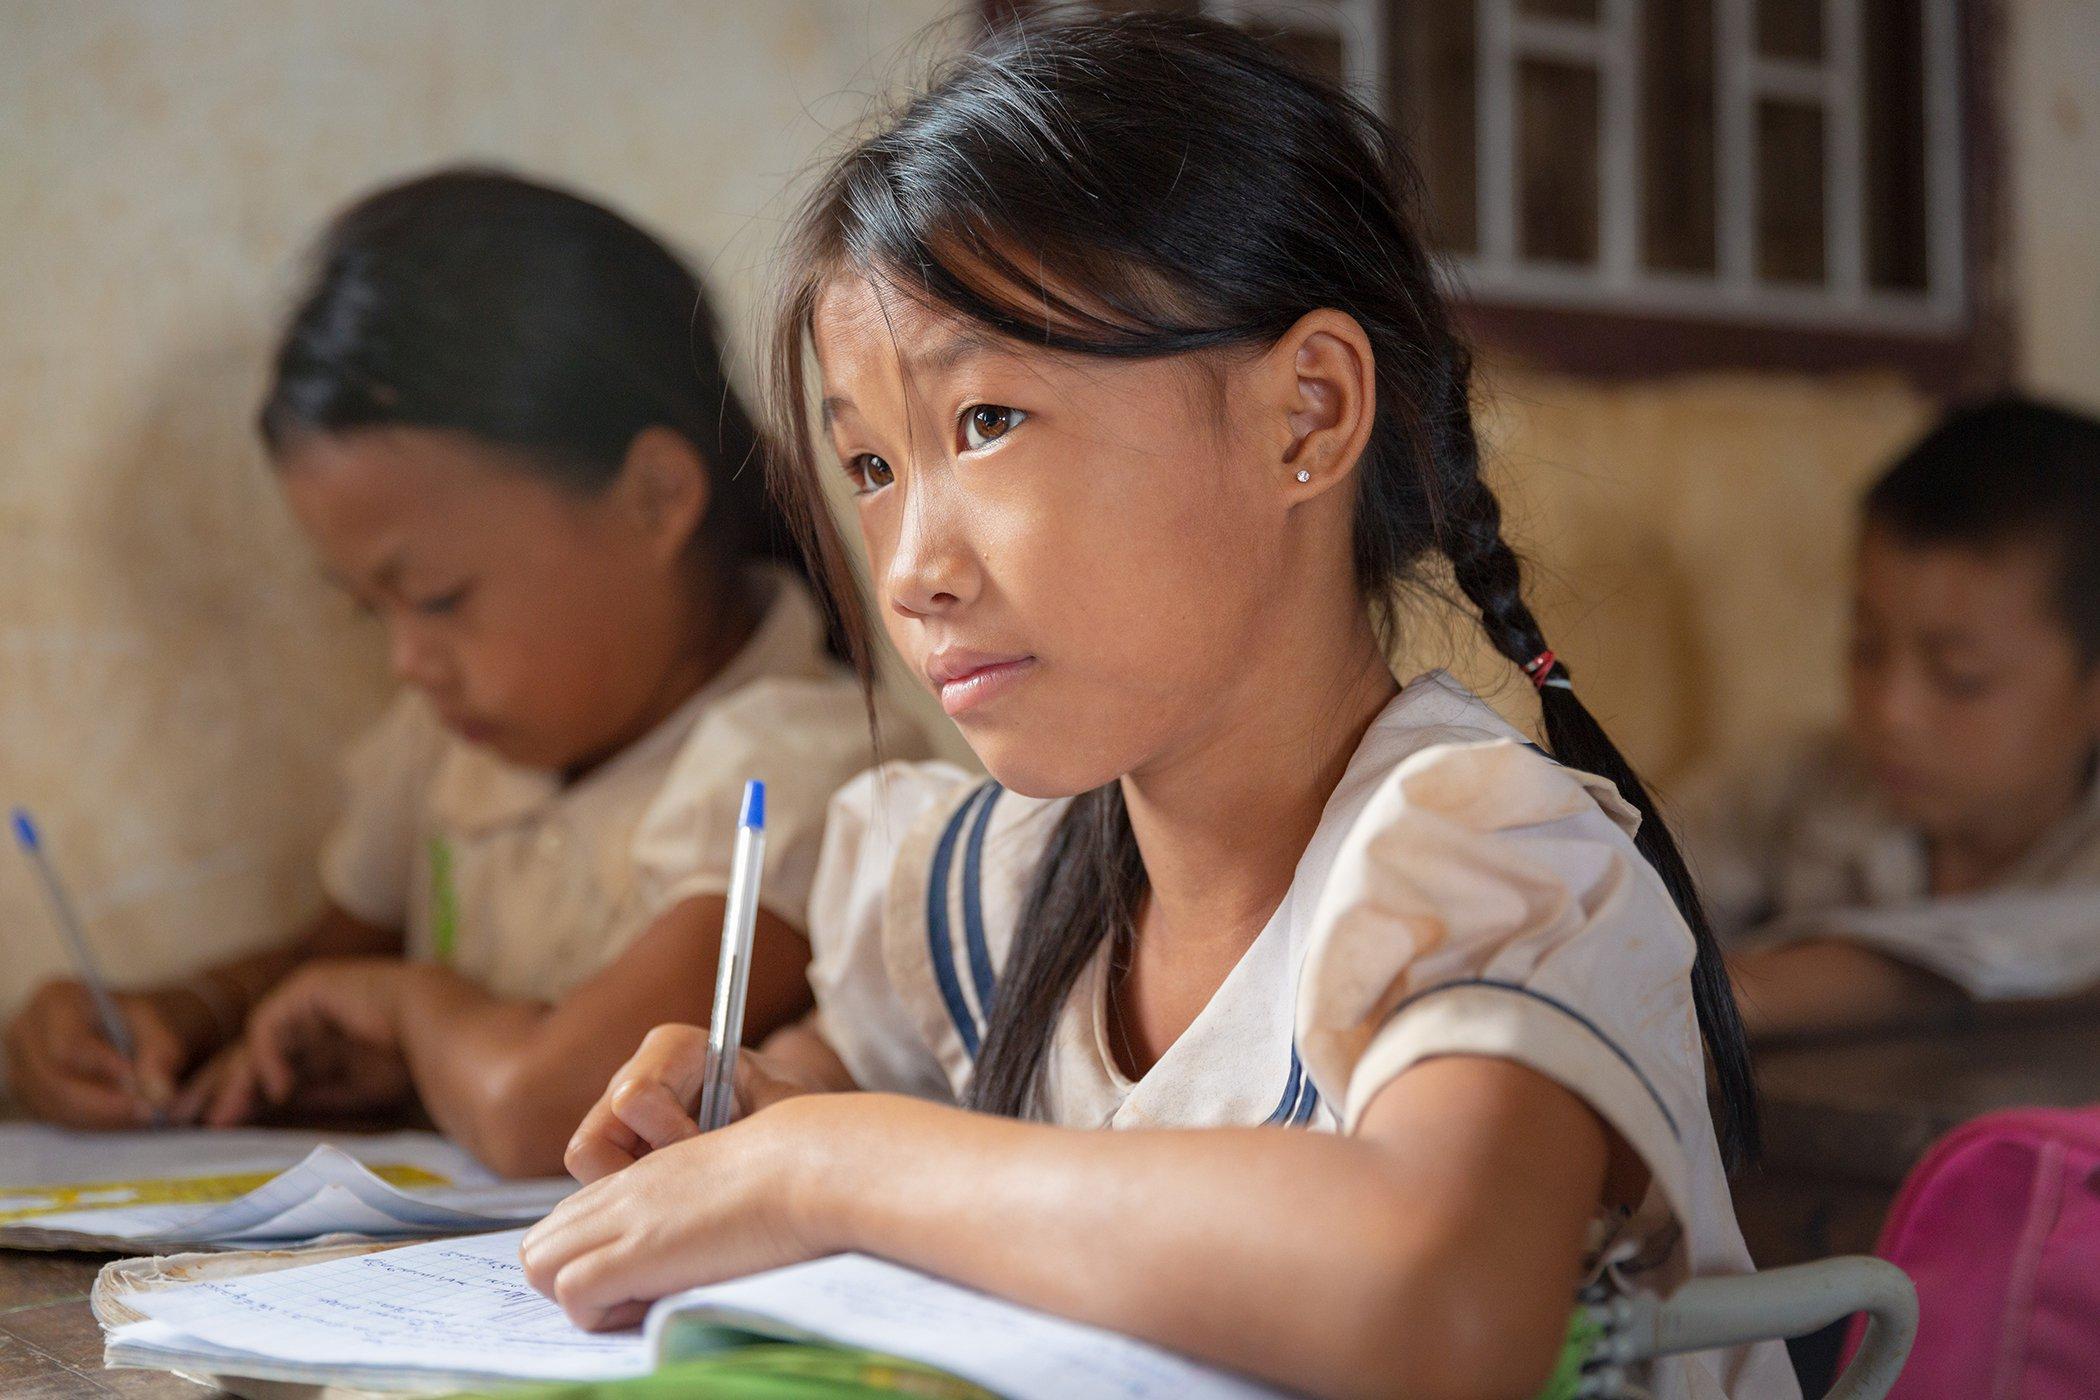 Women-Climate-Change-Girls-Education-003.jpg